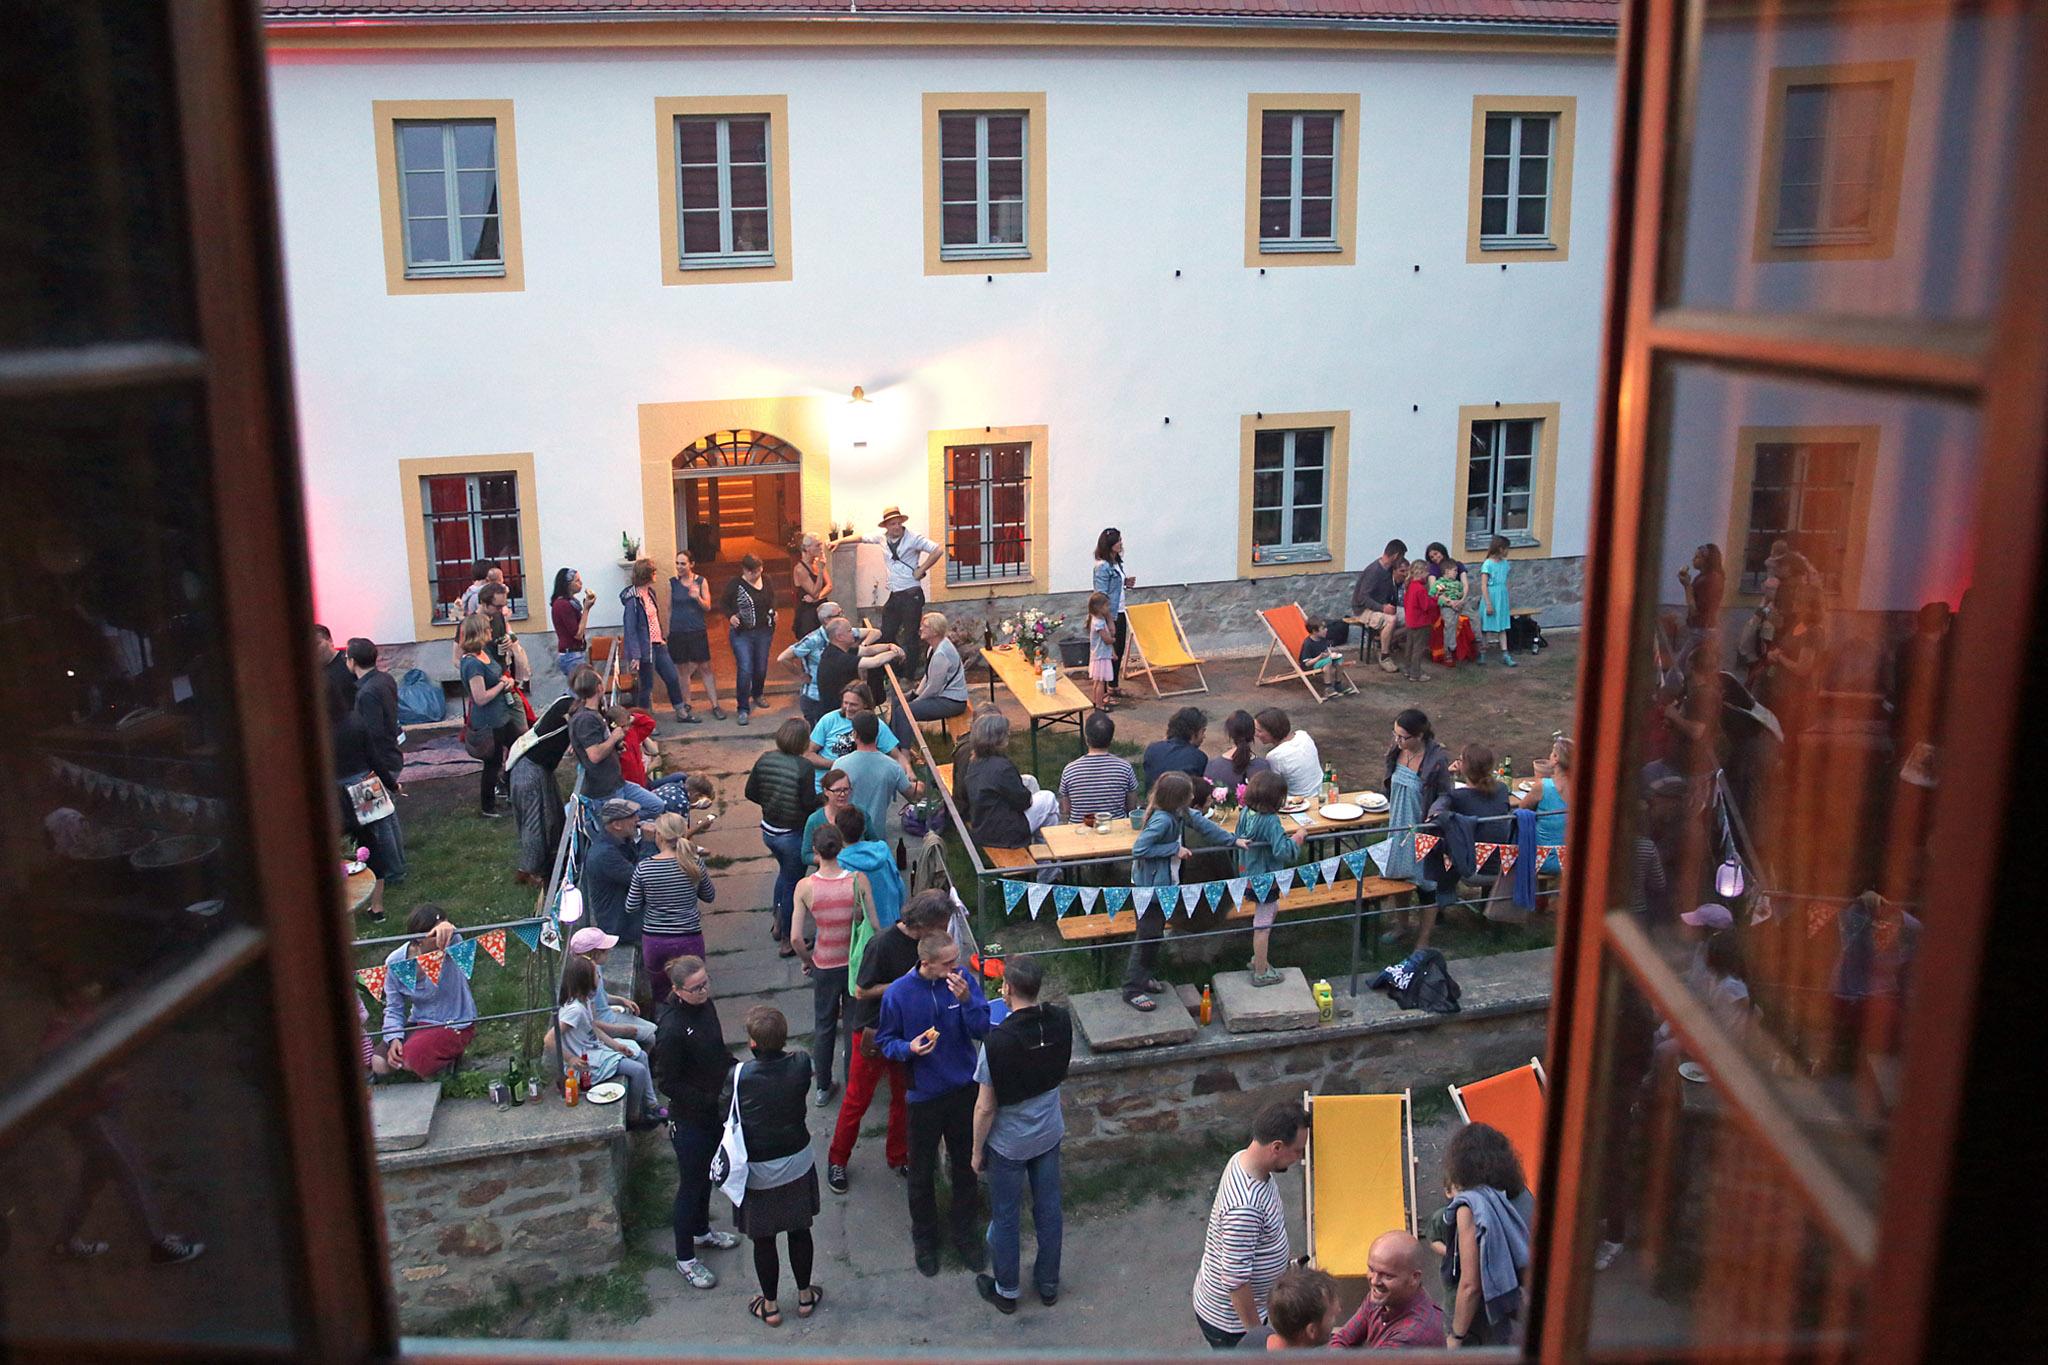 Erstes ORLA Kulturfest. Pfarre Wachau. 2018  Foto: Matthias Schumann © ORLA e.V.